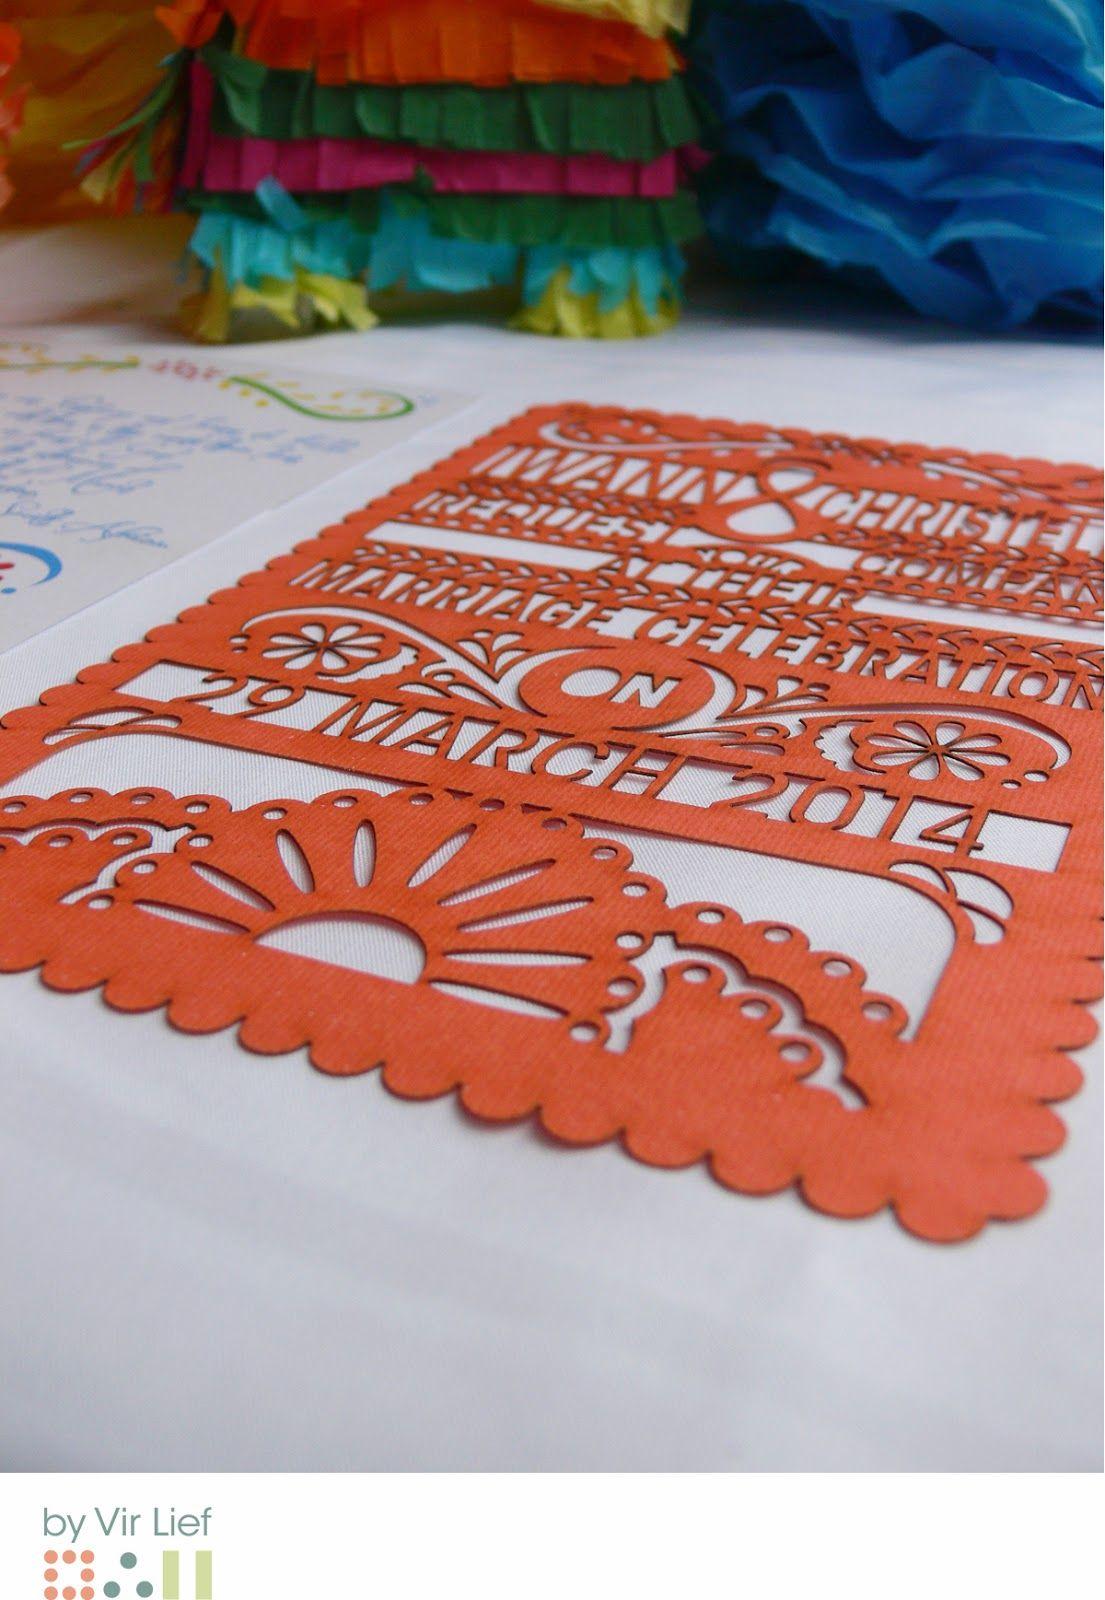 Colourful mexican themed wedding invitations by Vir Lief - lazer cut ...